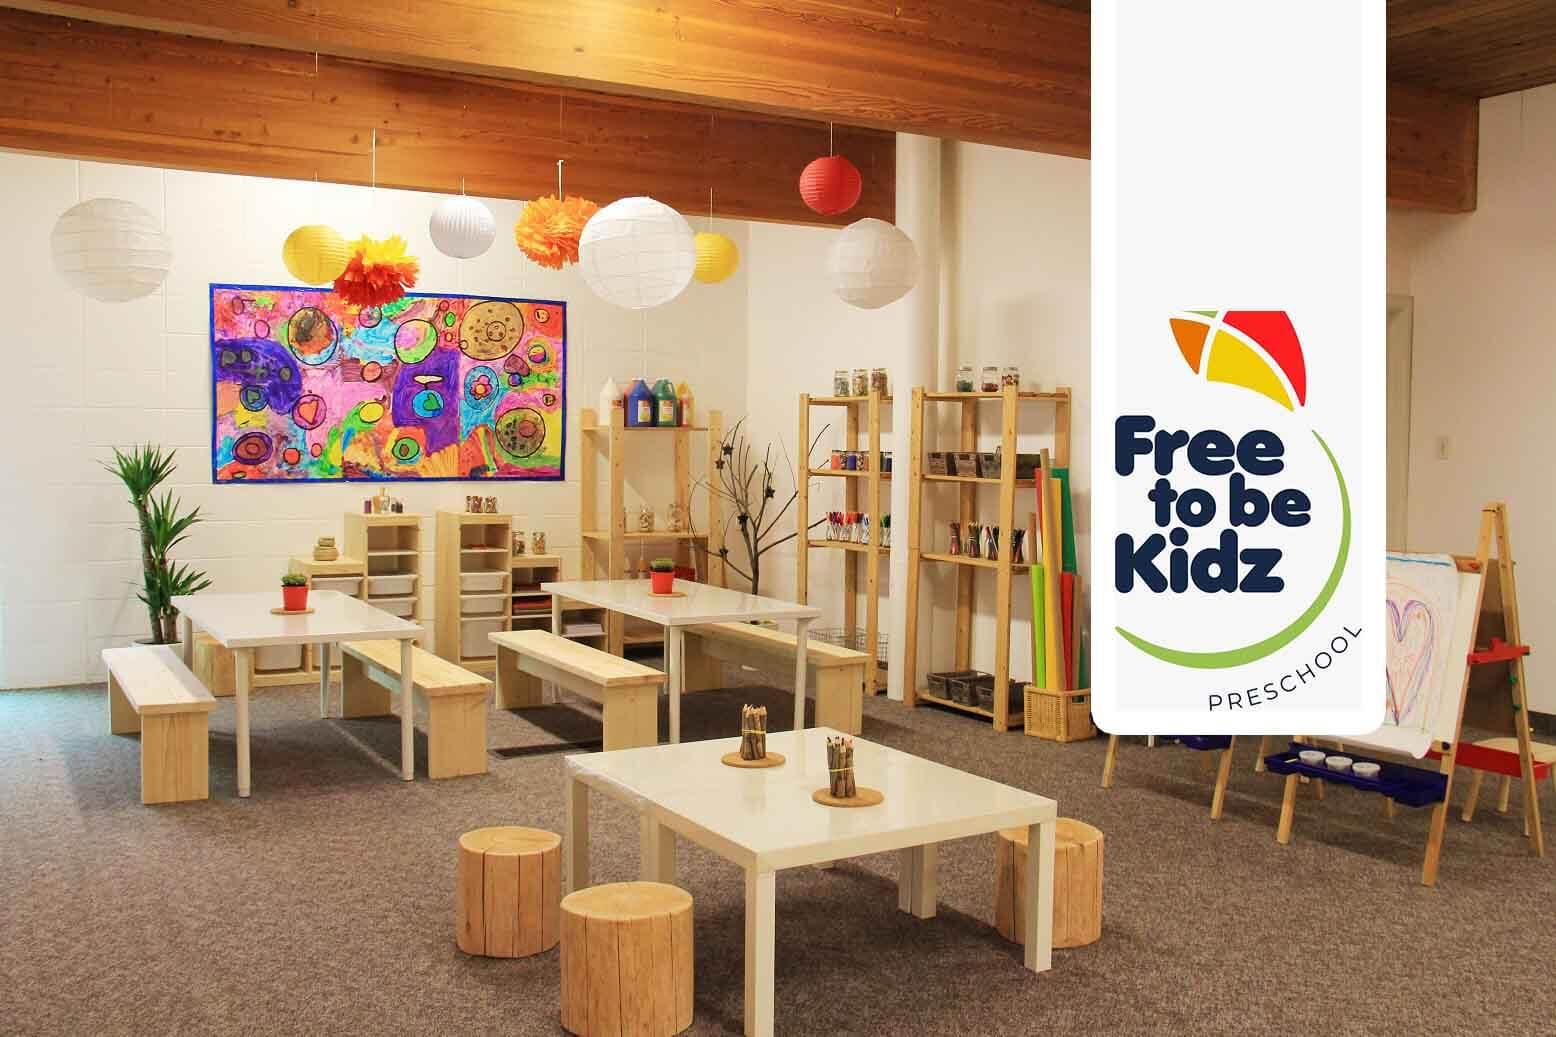 pré-escola no Canadá